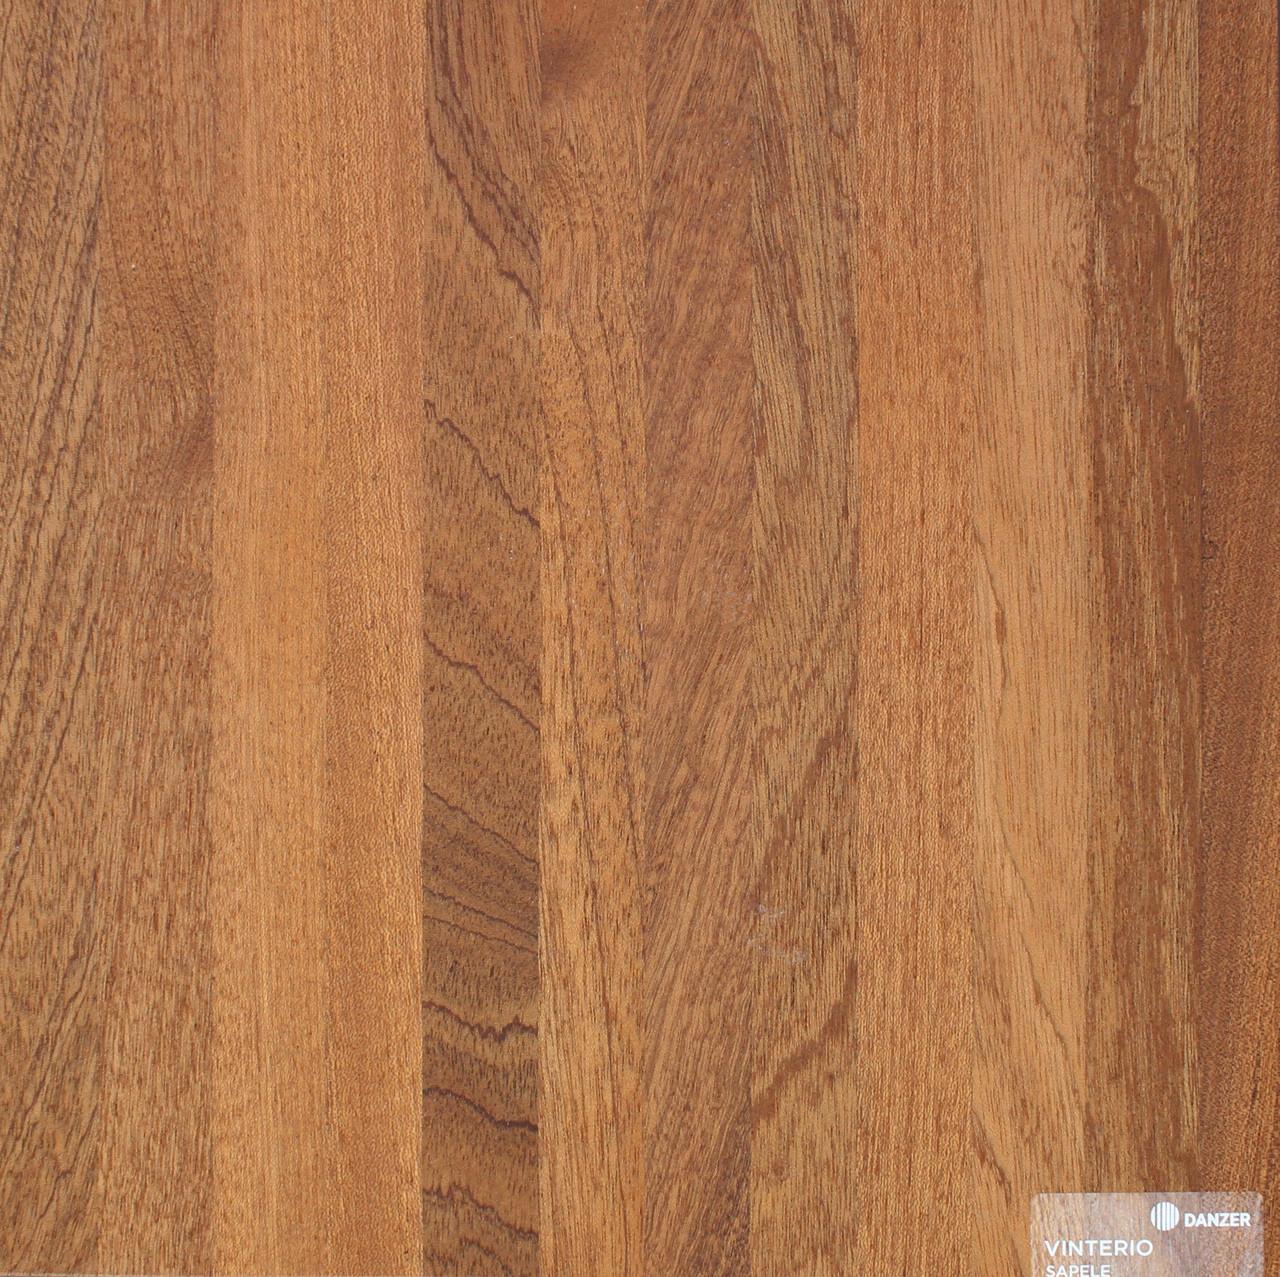 Sapele Vinterio Wood Veneer By Danzer Classic Superior